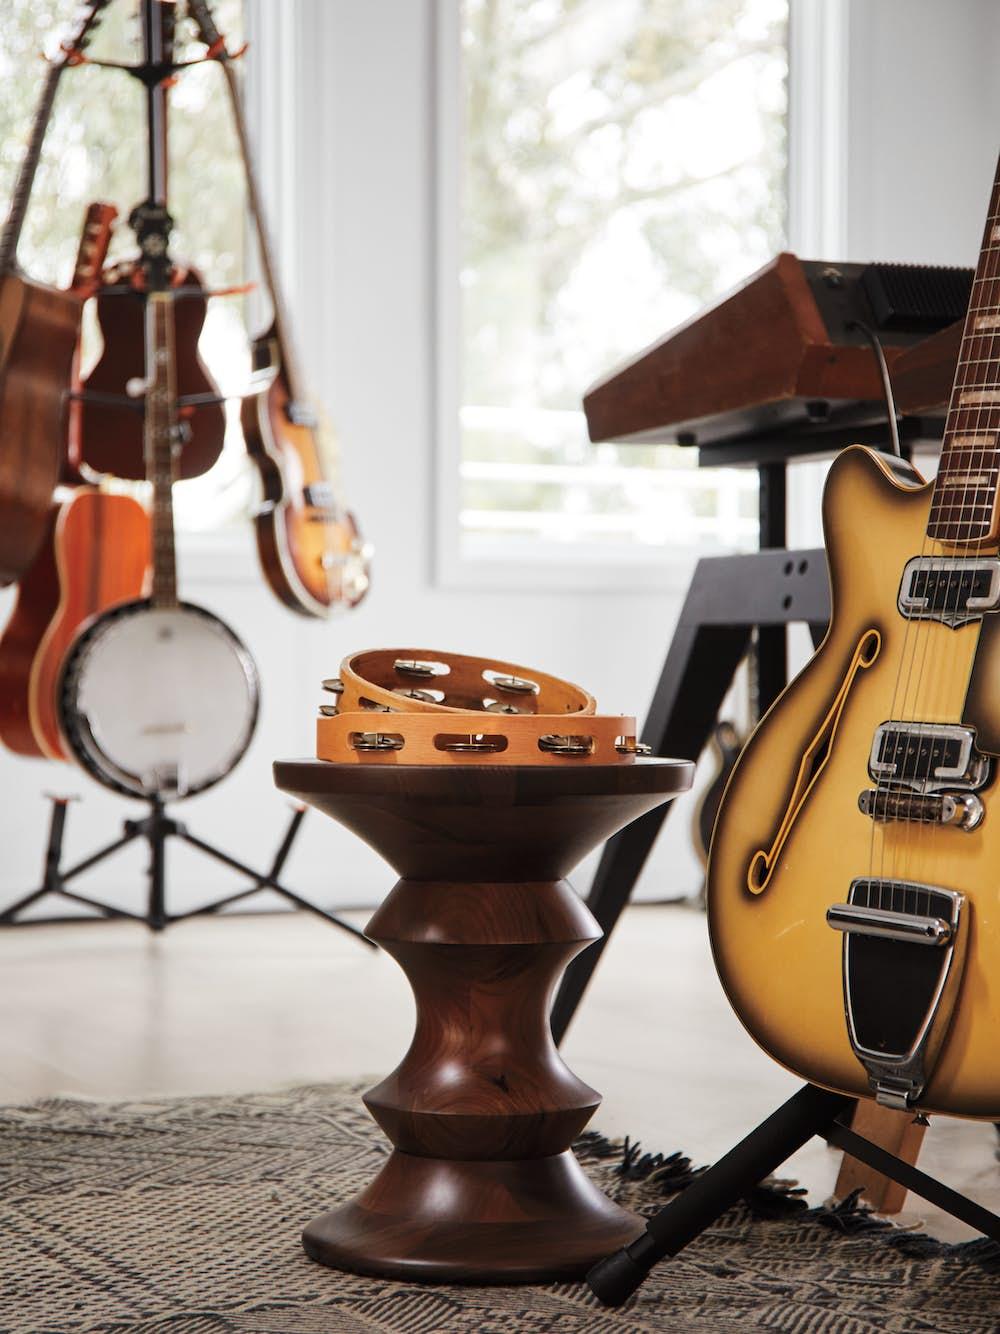 Eames Walnut Stool in Rostam's Studio